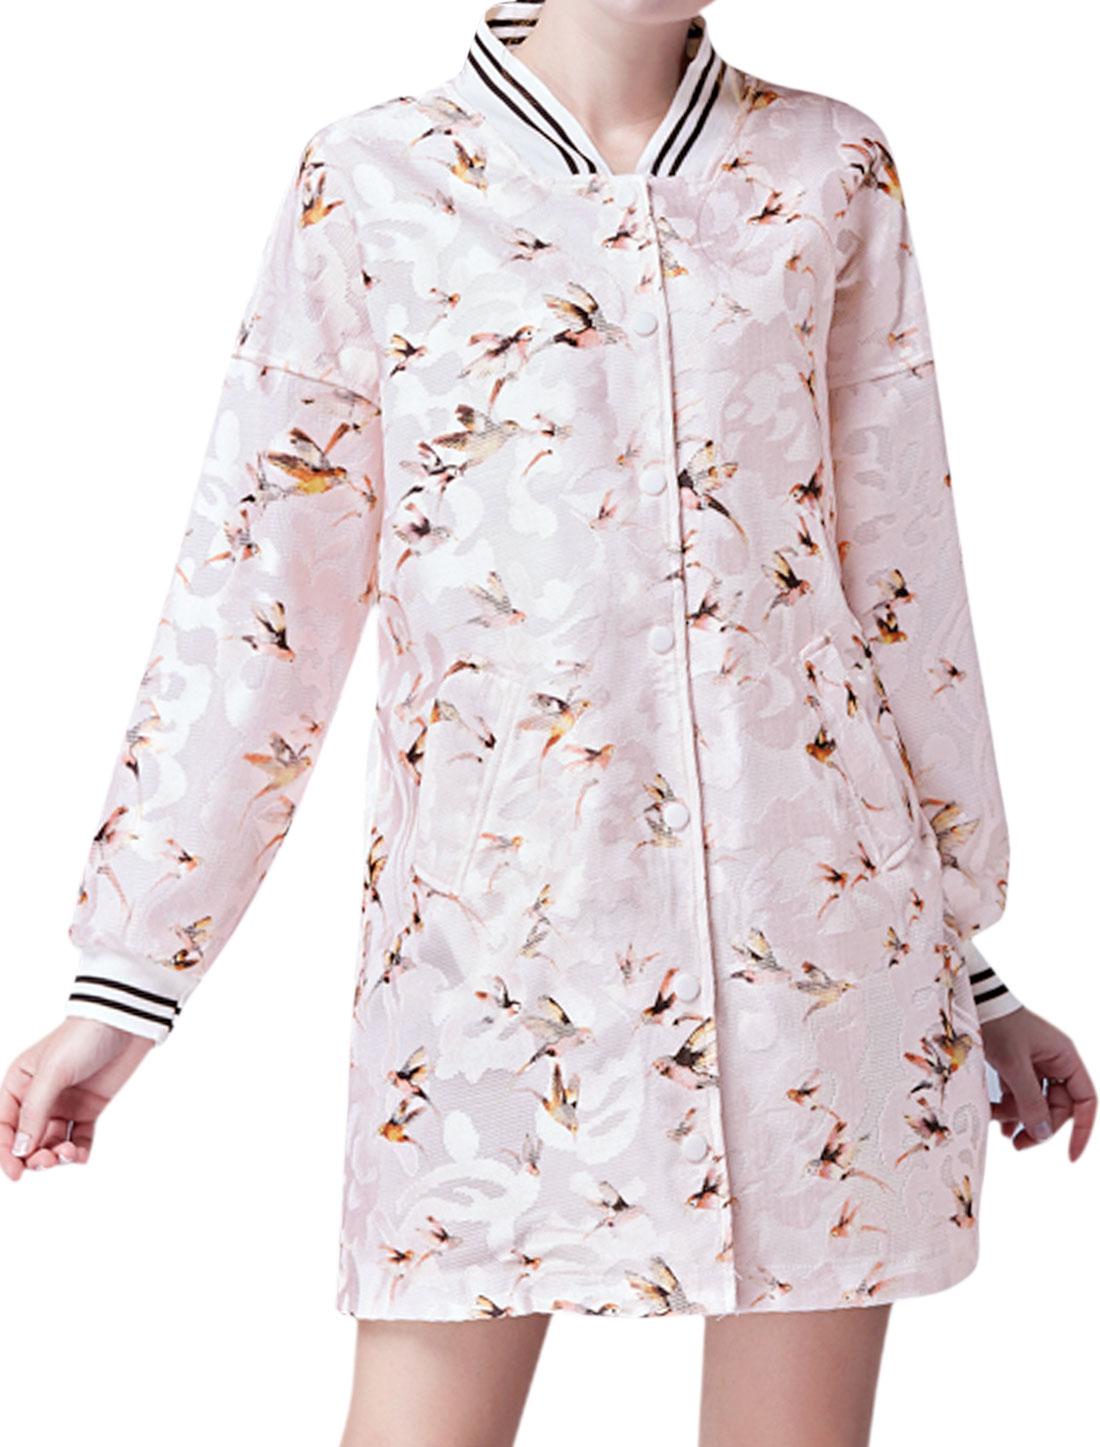 Women Buttoned Varsity Stripes Birds Pattern Tunic Jacket Pink L